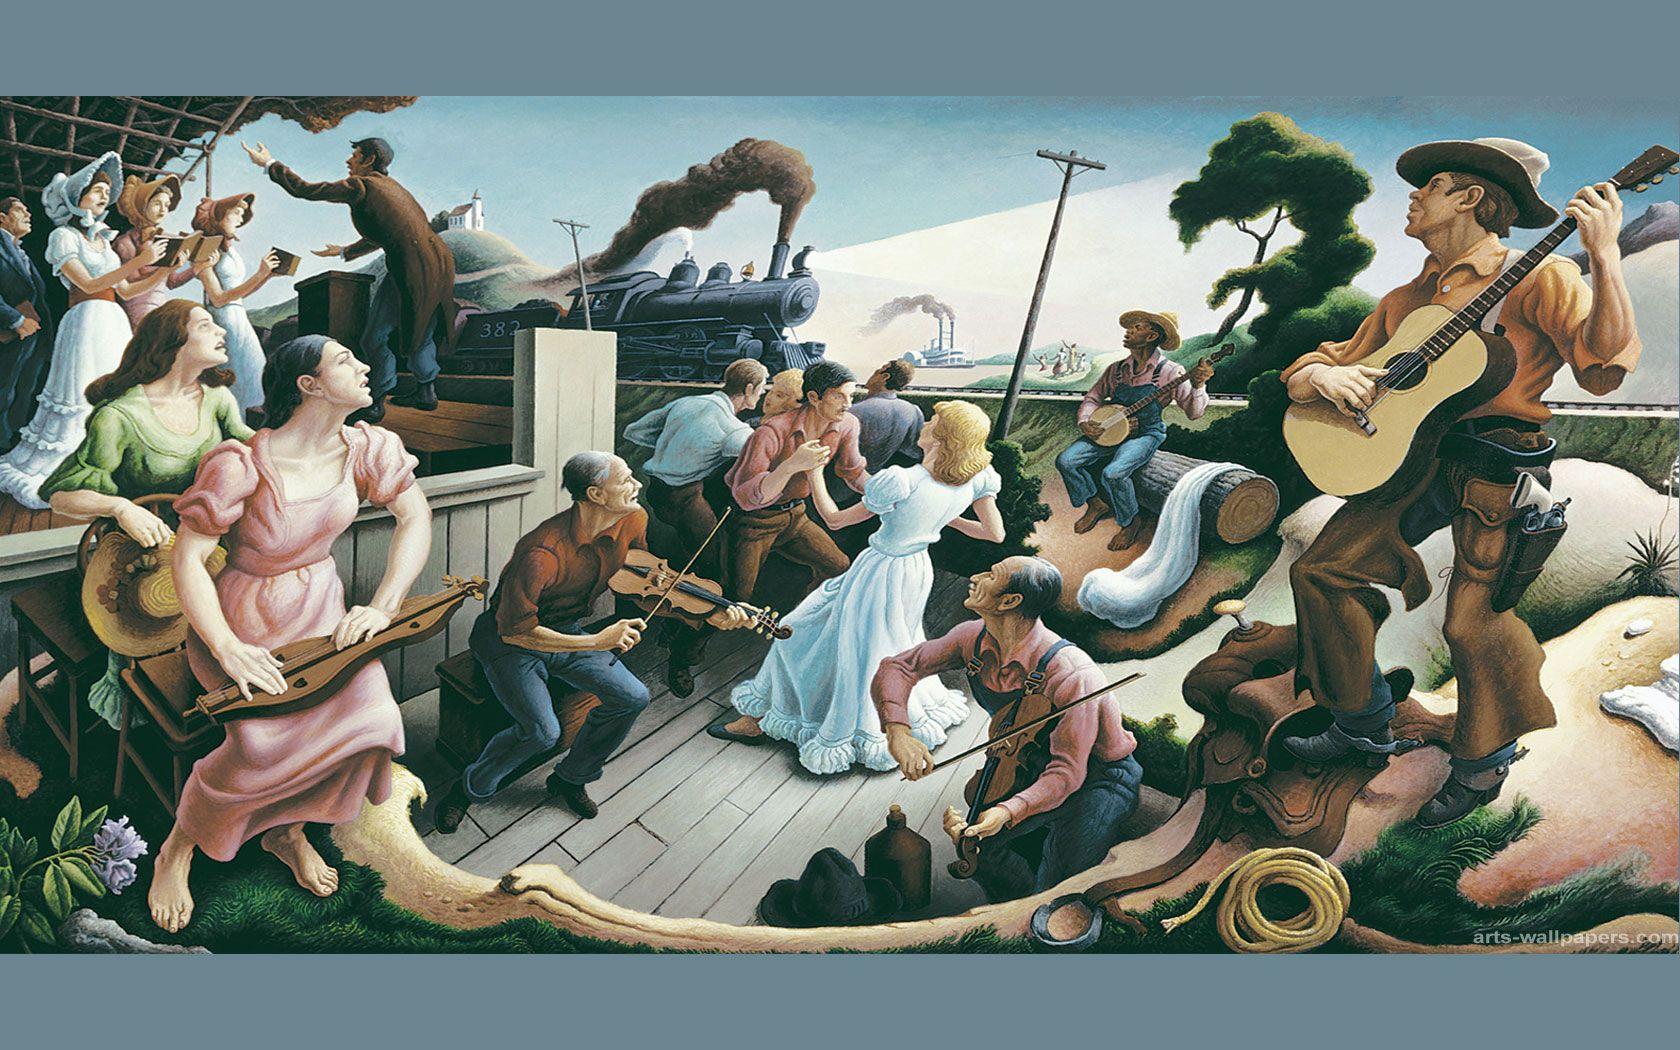 Great Wallpaper Music Painting - f3f51b3092307ae841246e06d2f165a7  2018_439783.jpg